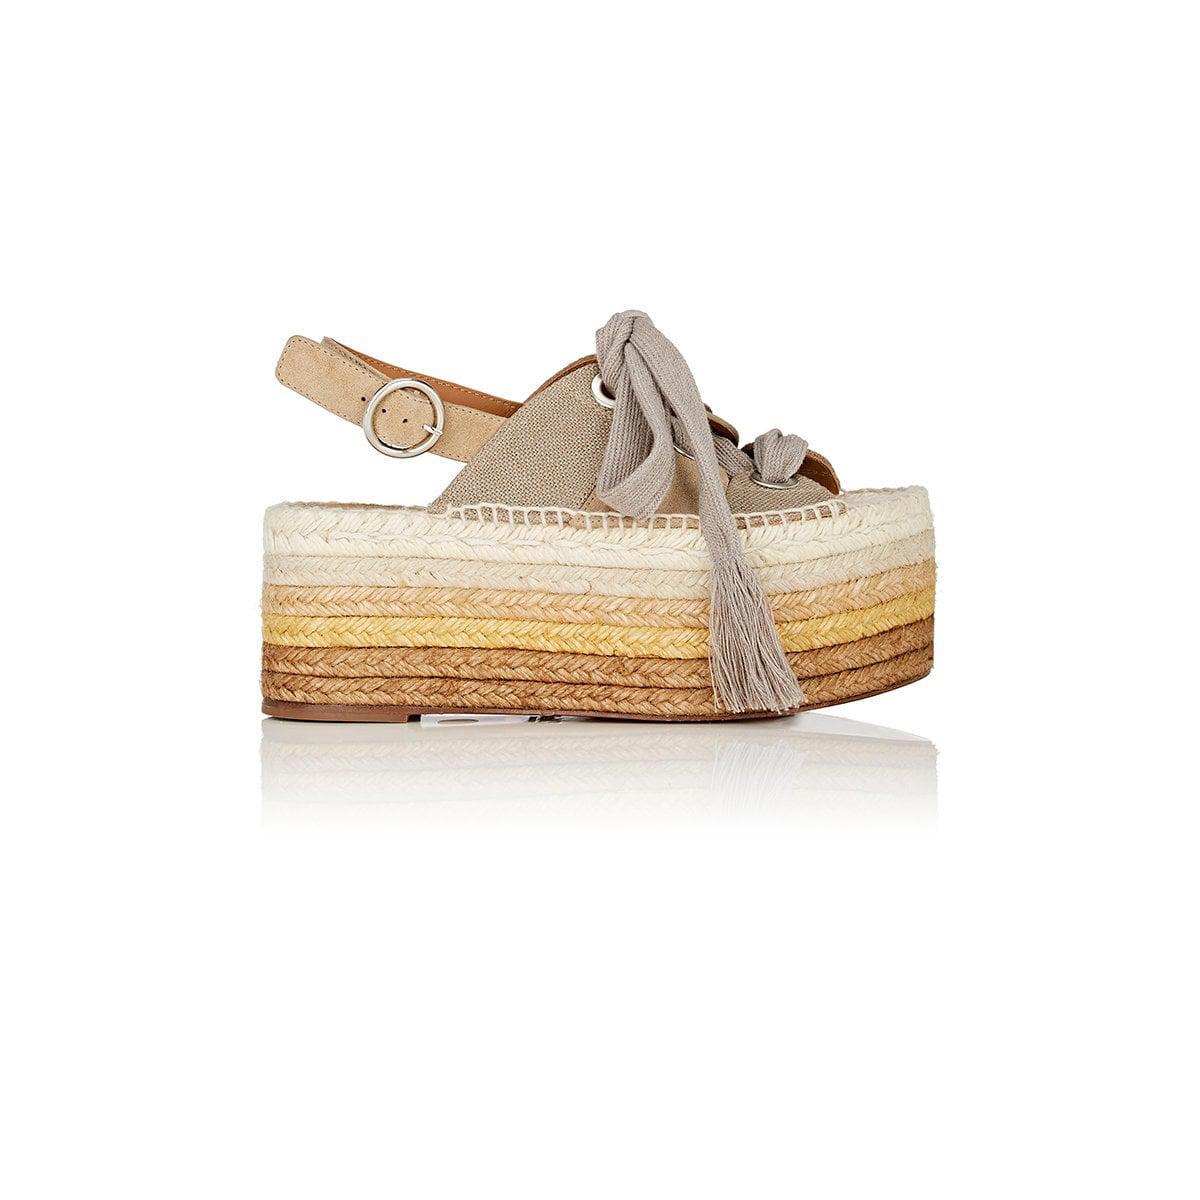 f7aed026610 Lyst - Chloé Qai Suede   Canvas Platform Espadrille Sandals in Natural